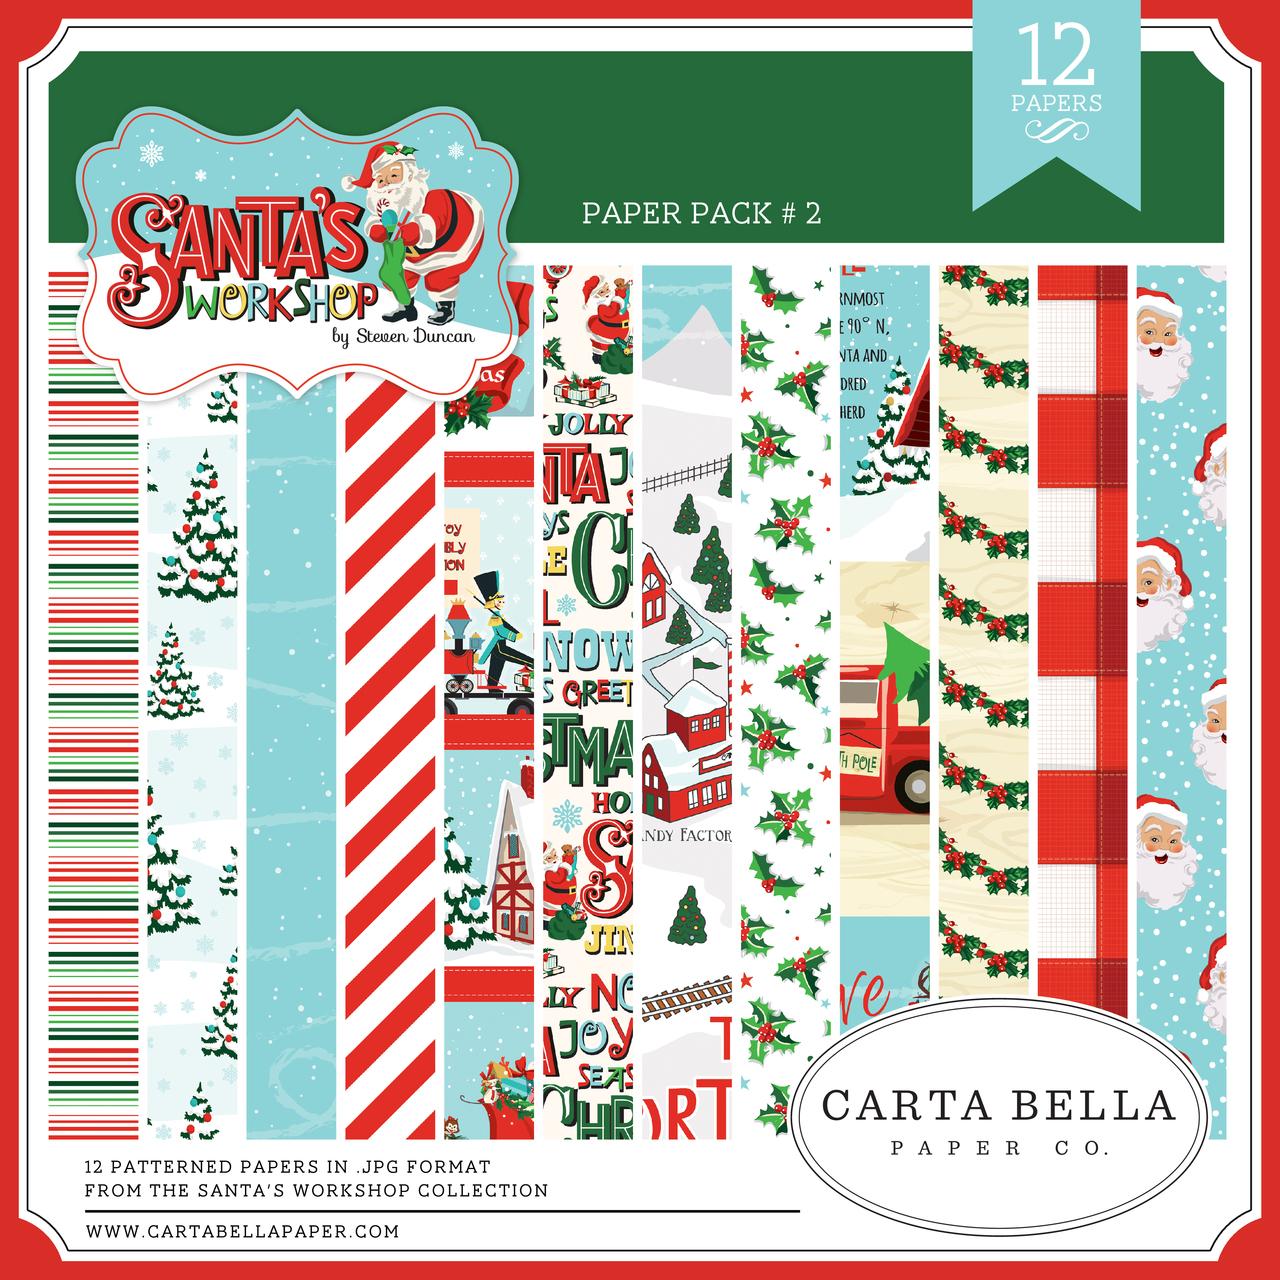 Santa's Workshop Paper Pack #2